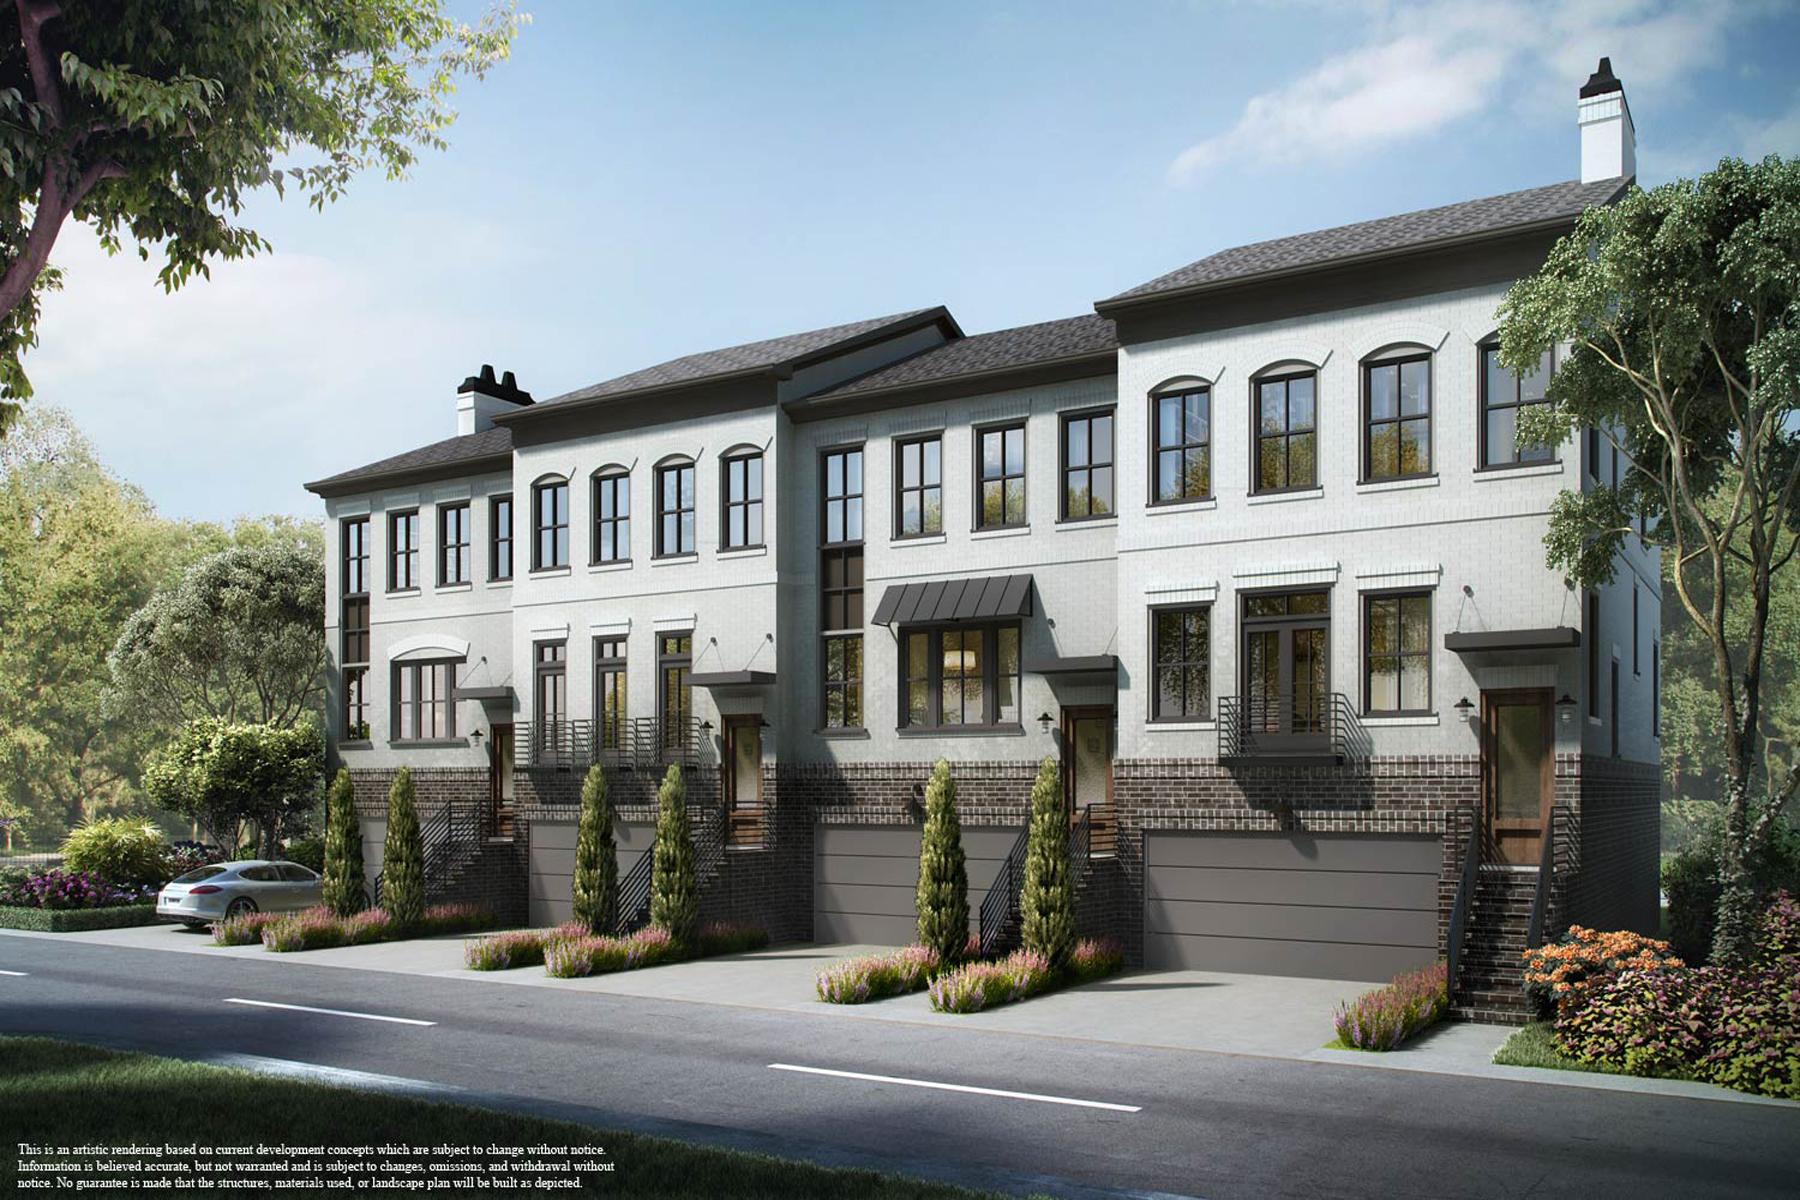 Таунхаус для того Продажа на Sophisticated Townhome in the Heart of Edgewood 1388 LaFrance Street Unit #4 Atlanta, Джорджия, 30307 Соединенные Штаты